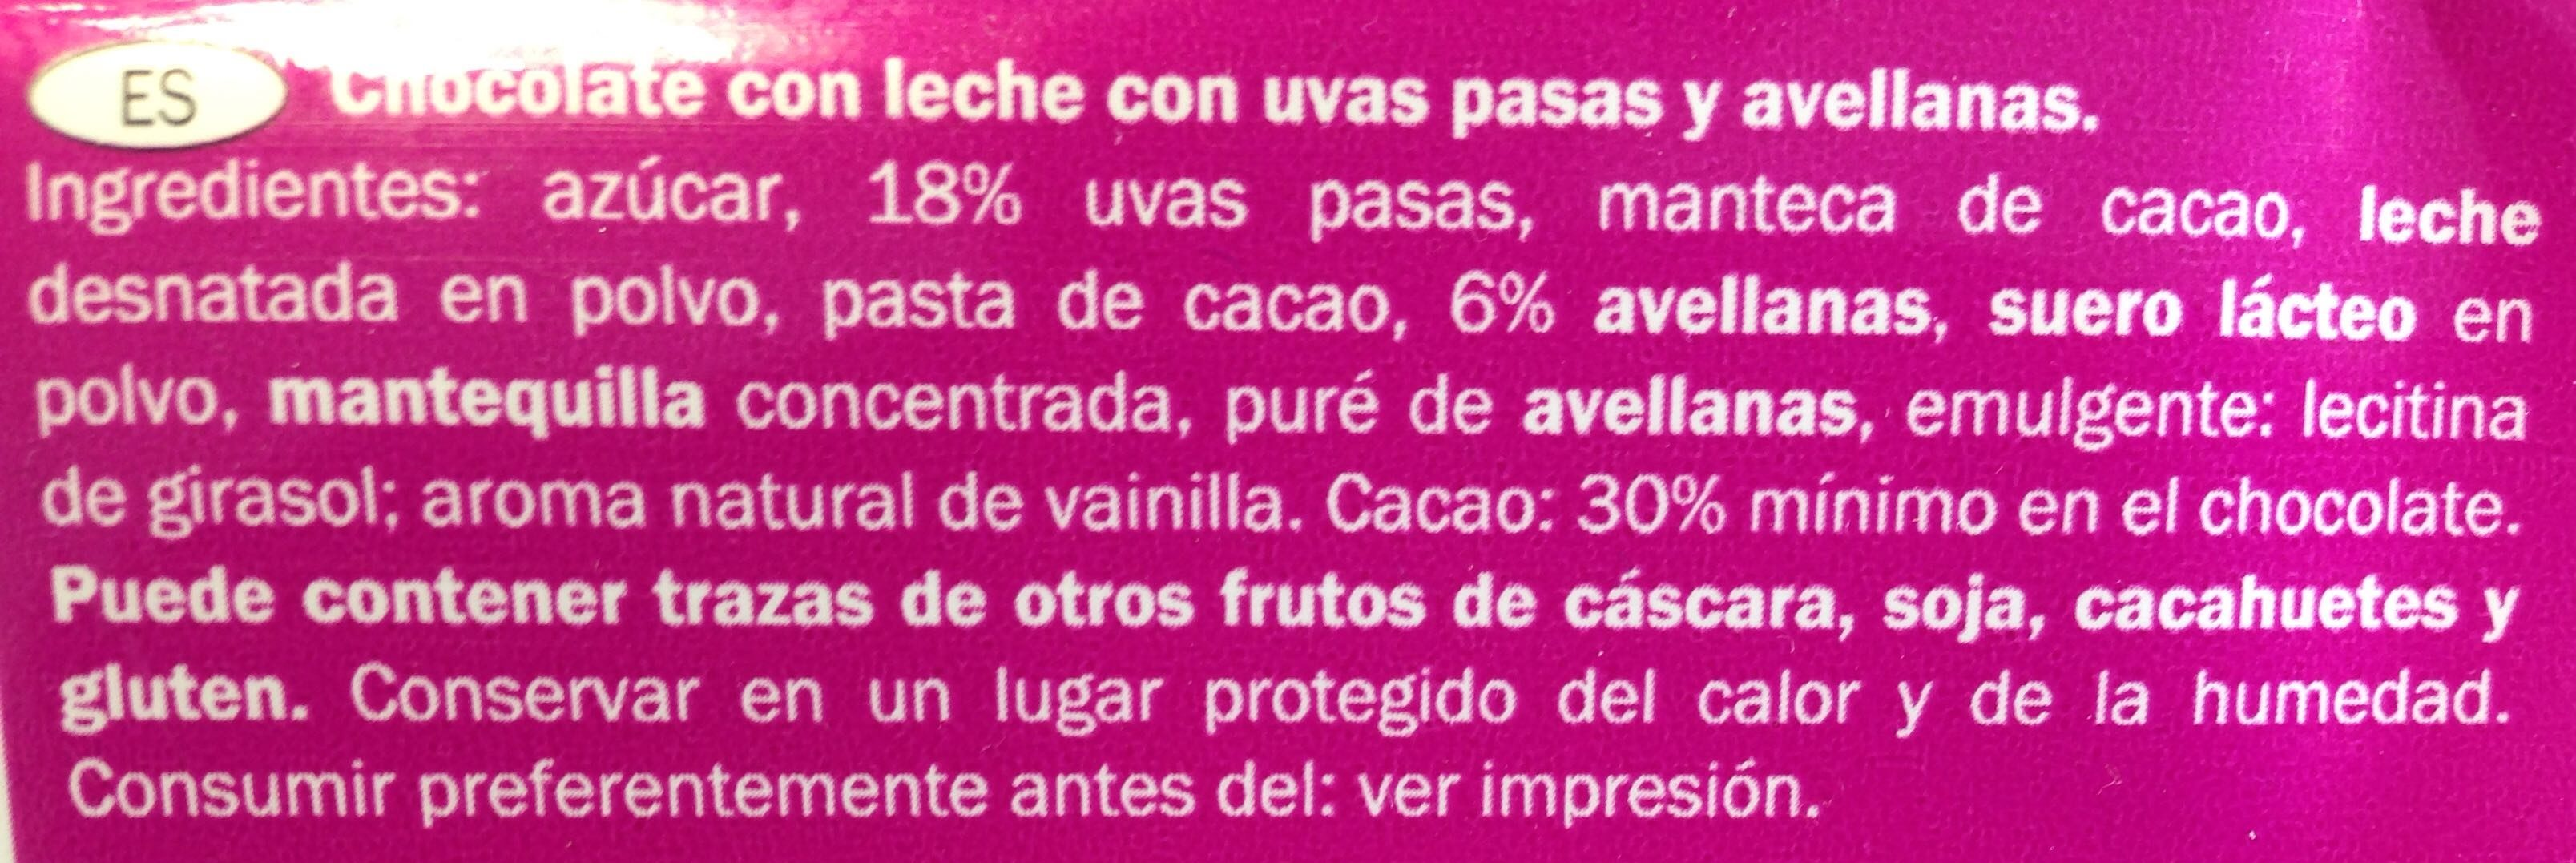 Chocolate Frutos Secos - Ingredientes